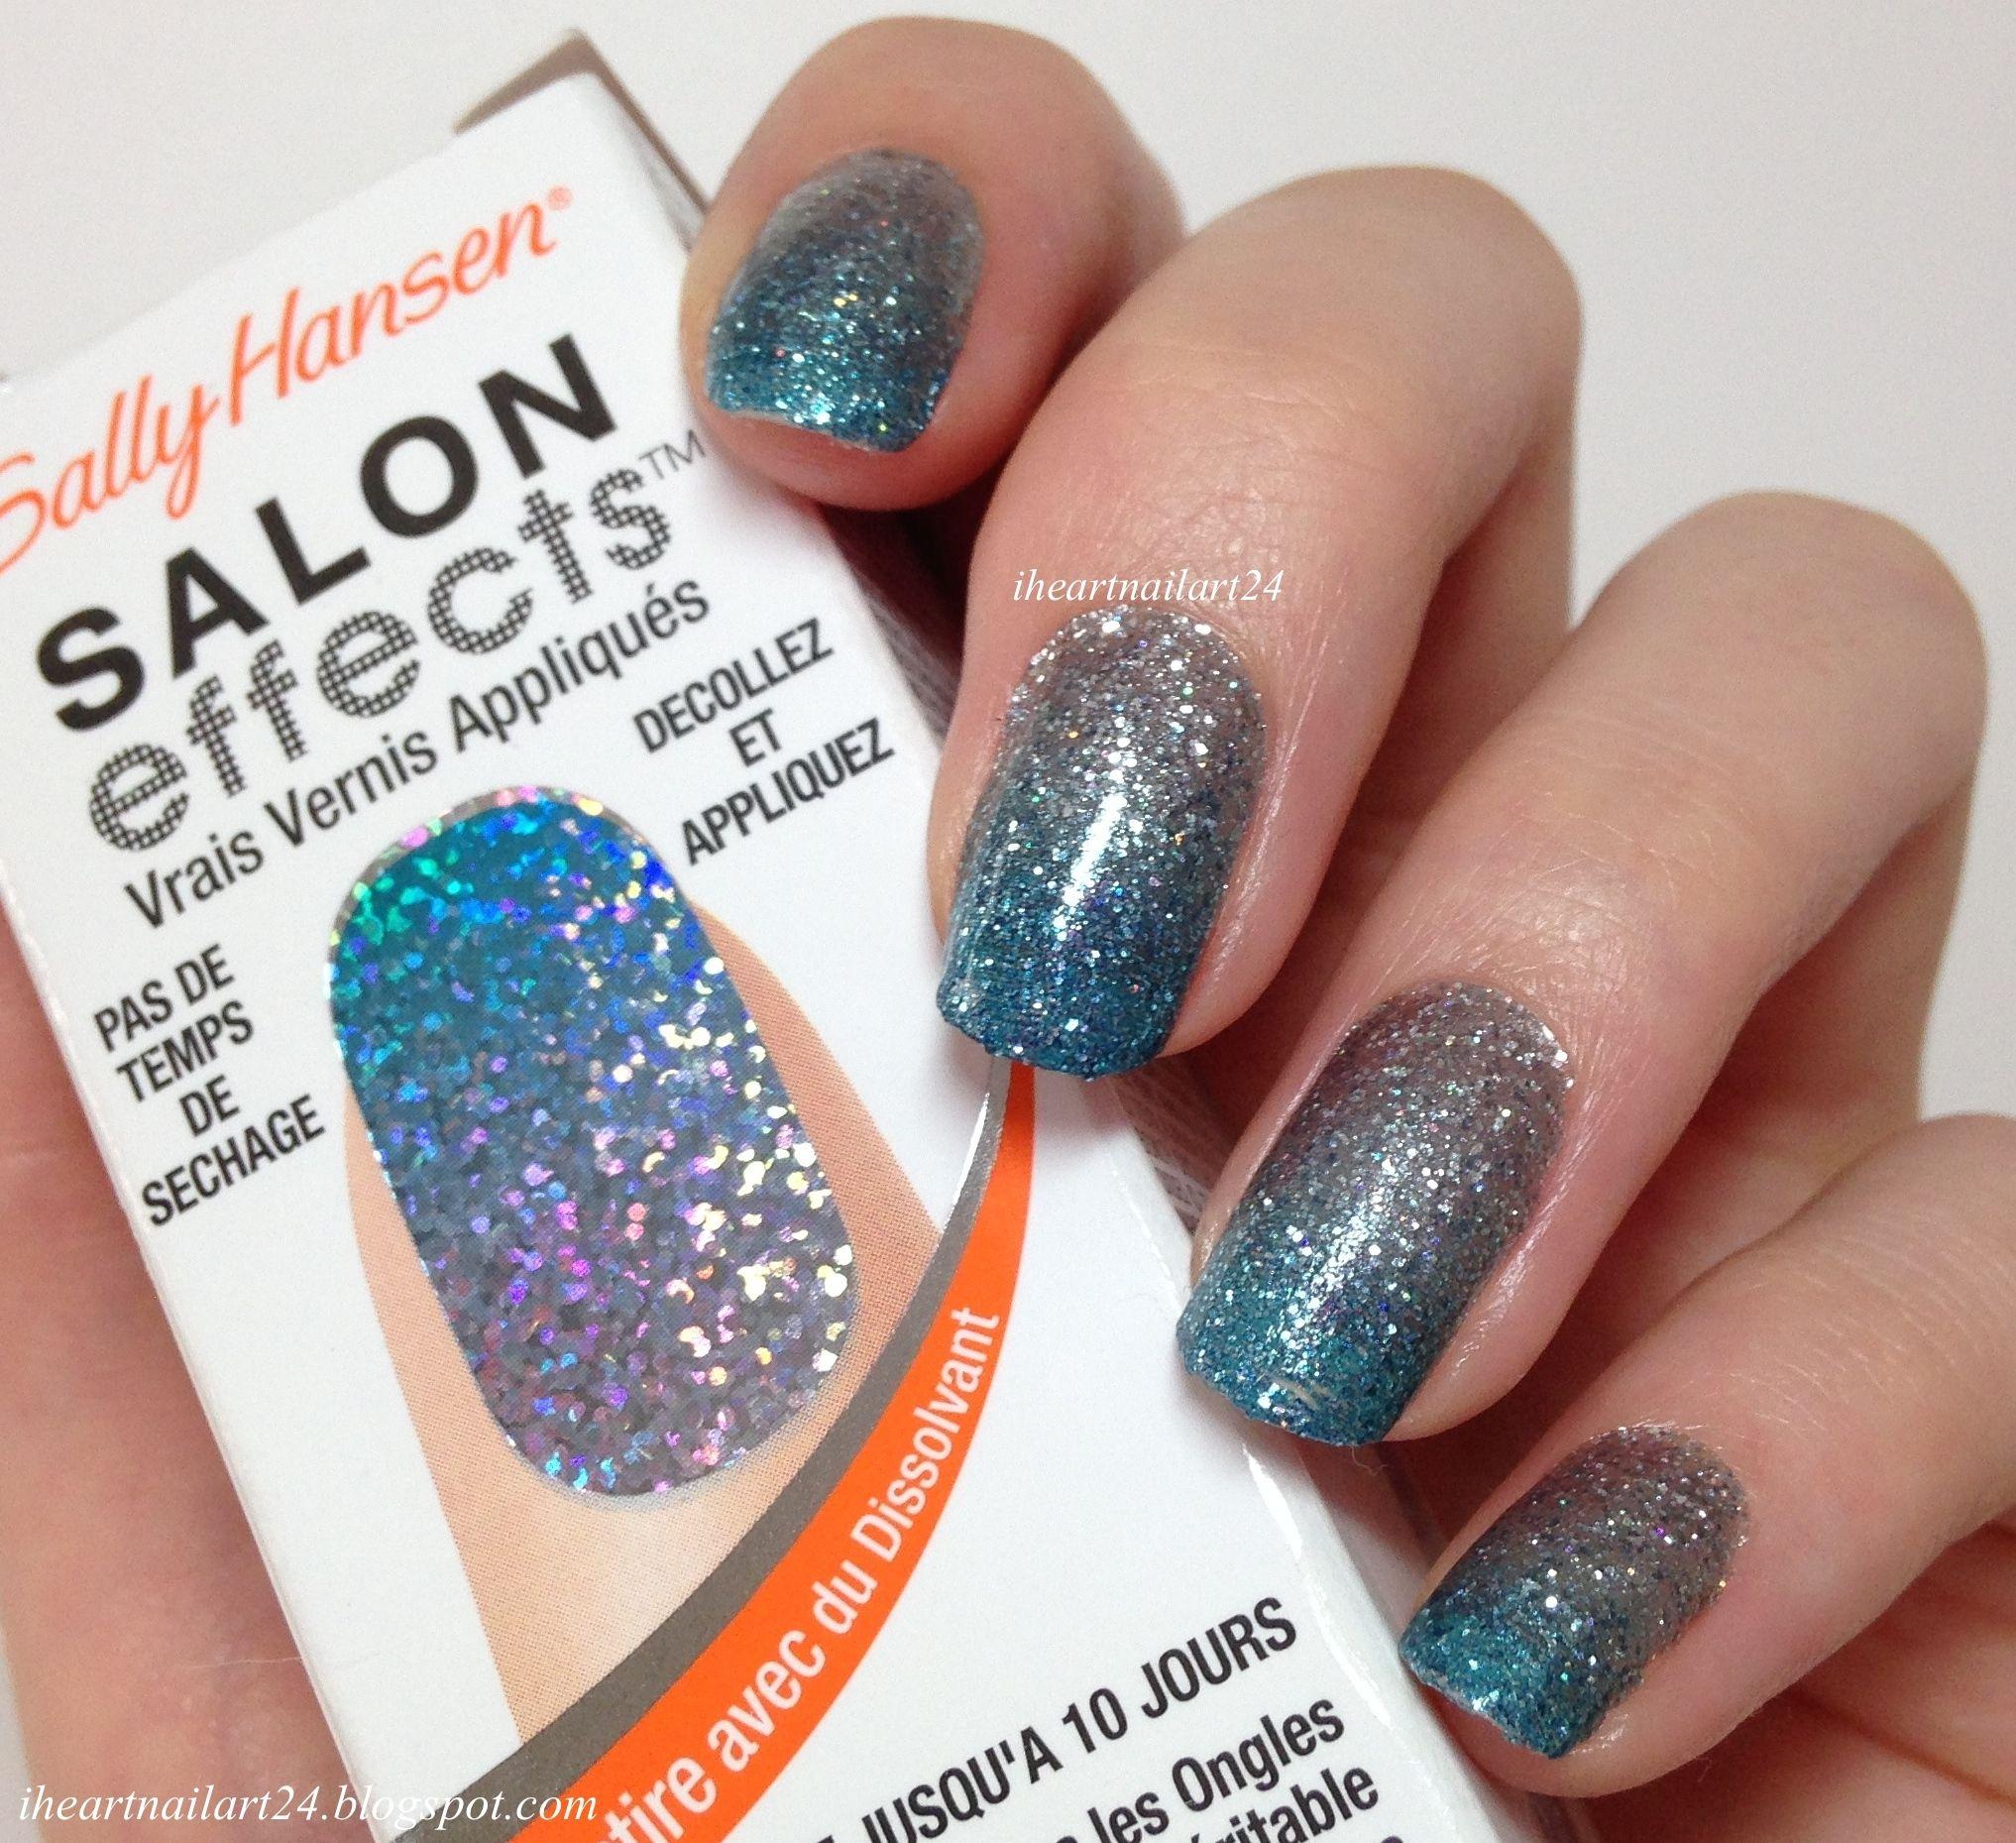 Sally Hansen Salon Effects Nail Polish Strips Review